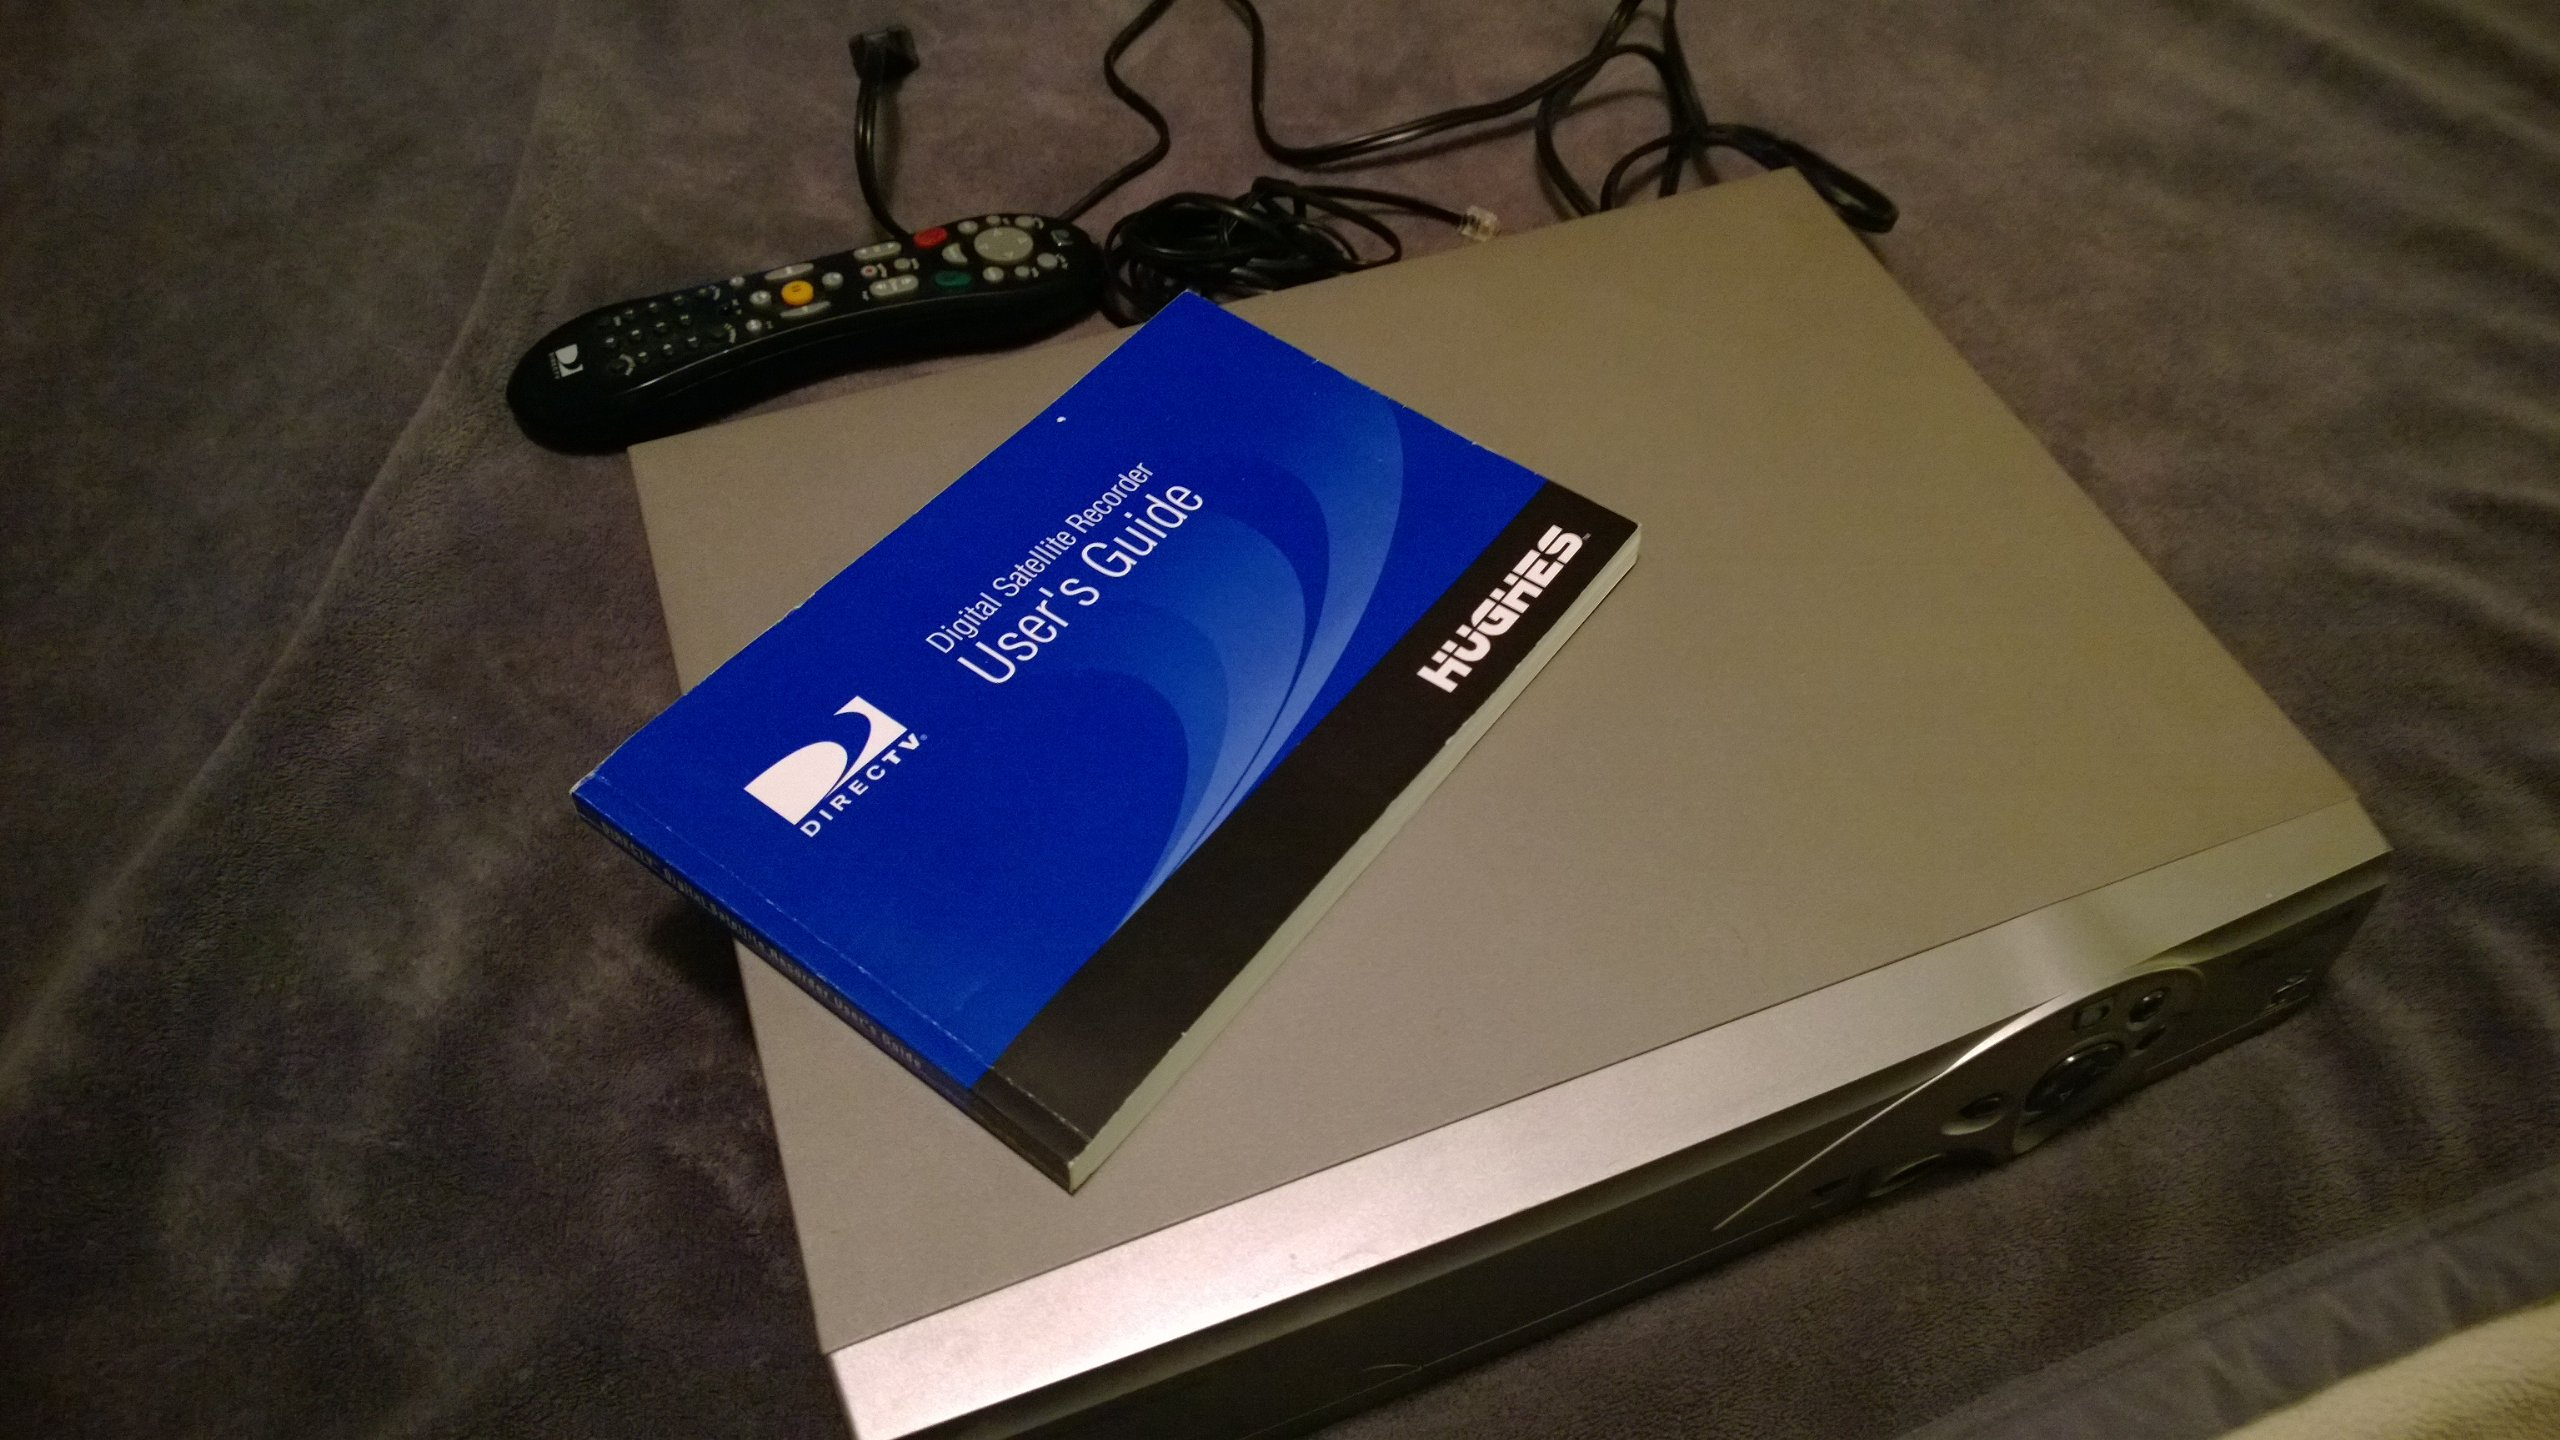 Hughes digital satellite receiver user manual hird d25 on popscreen.